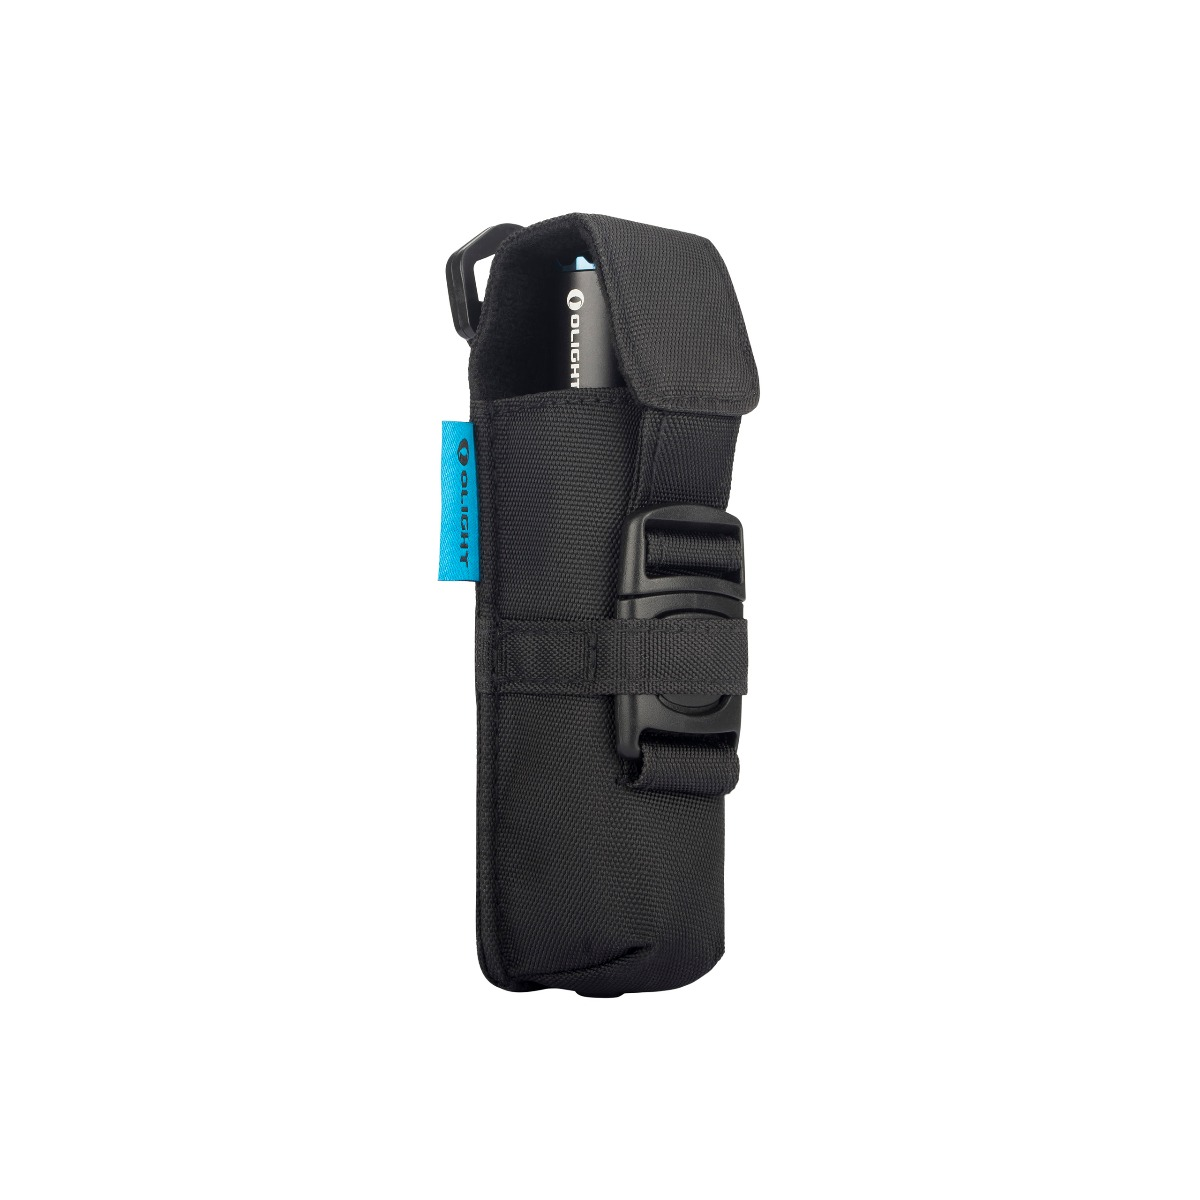 M2R Pro holster